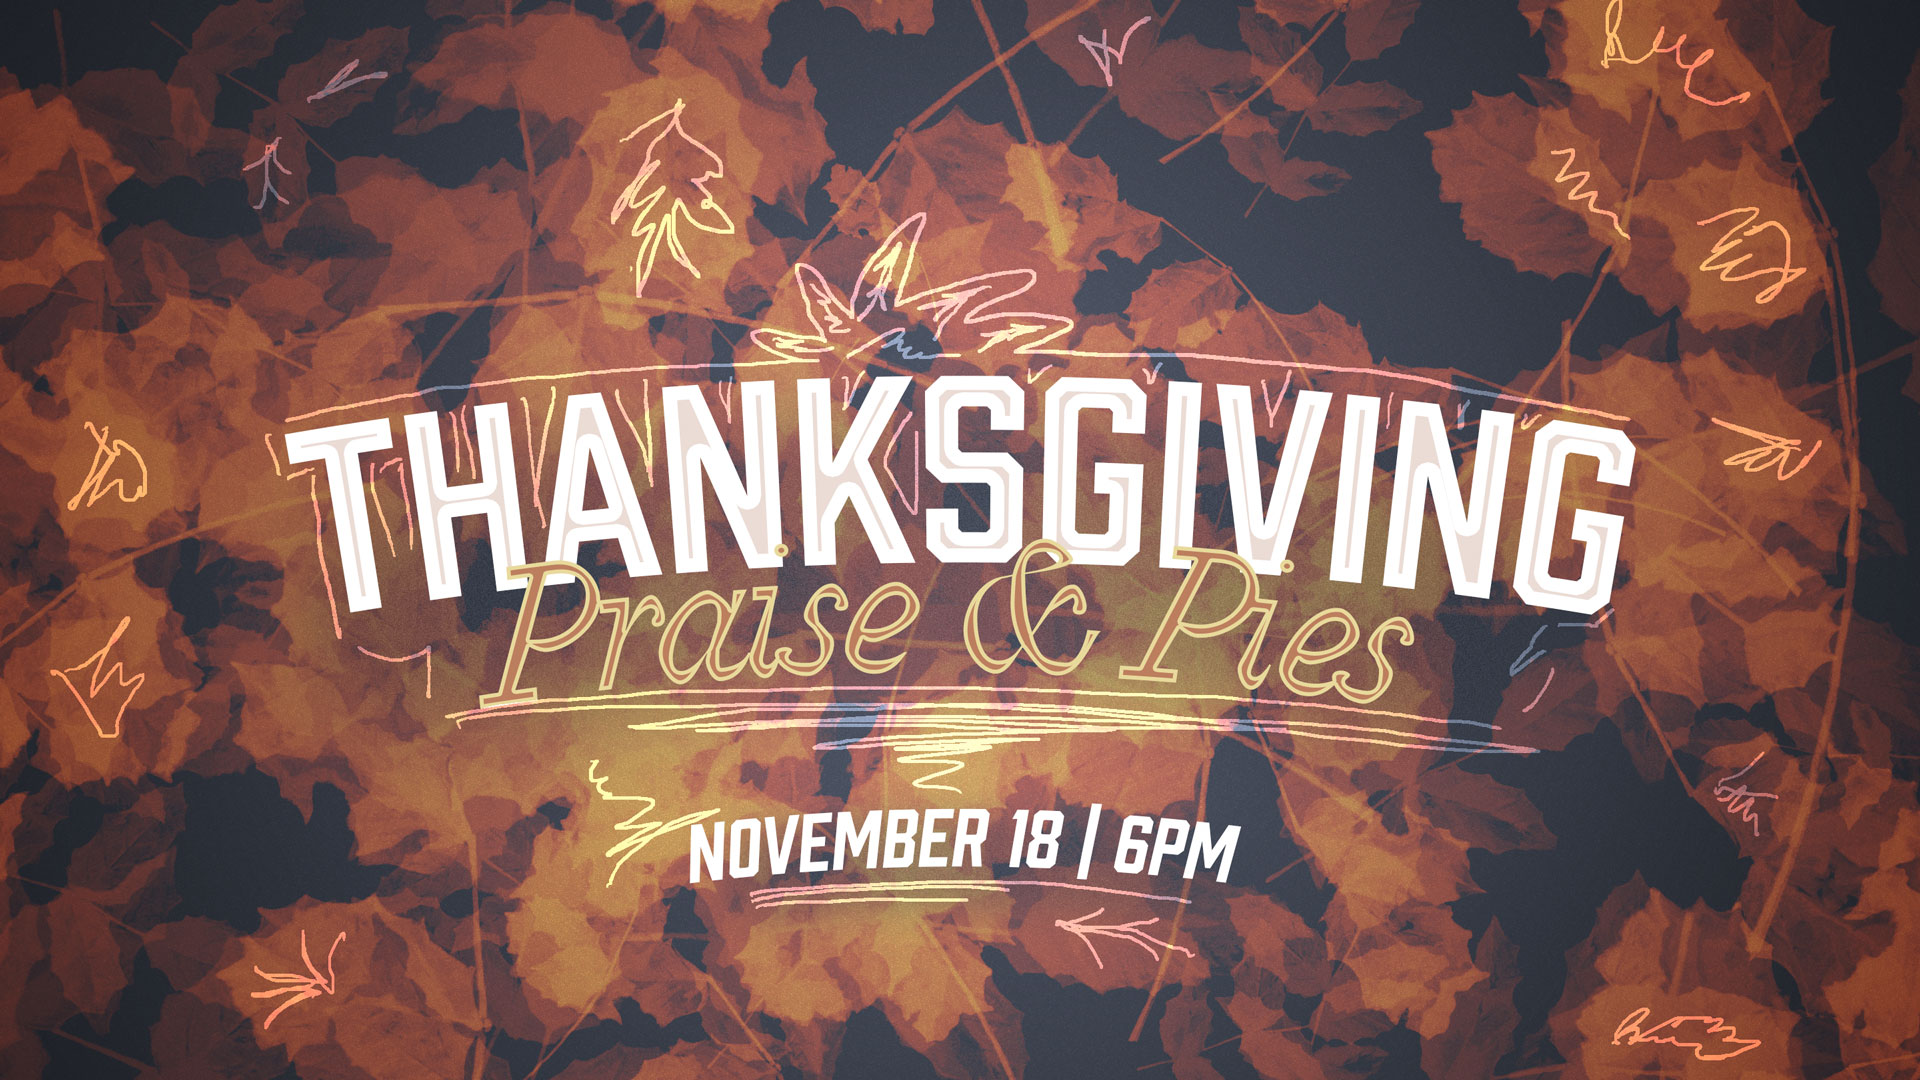 Thanksgiving-Praise-and-Pies-2018.jpg